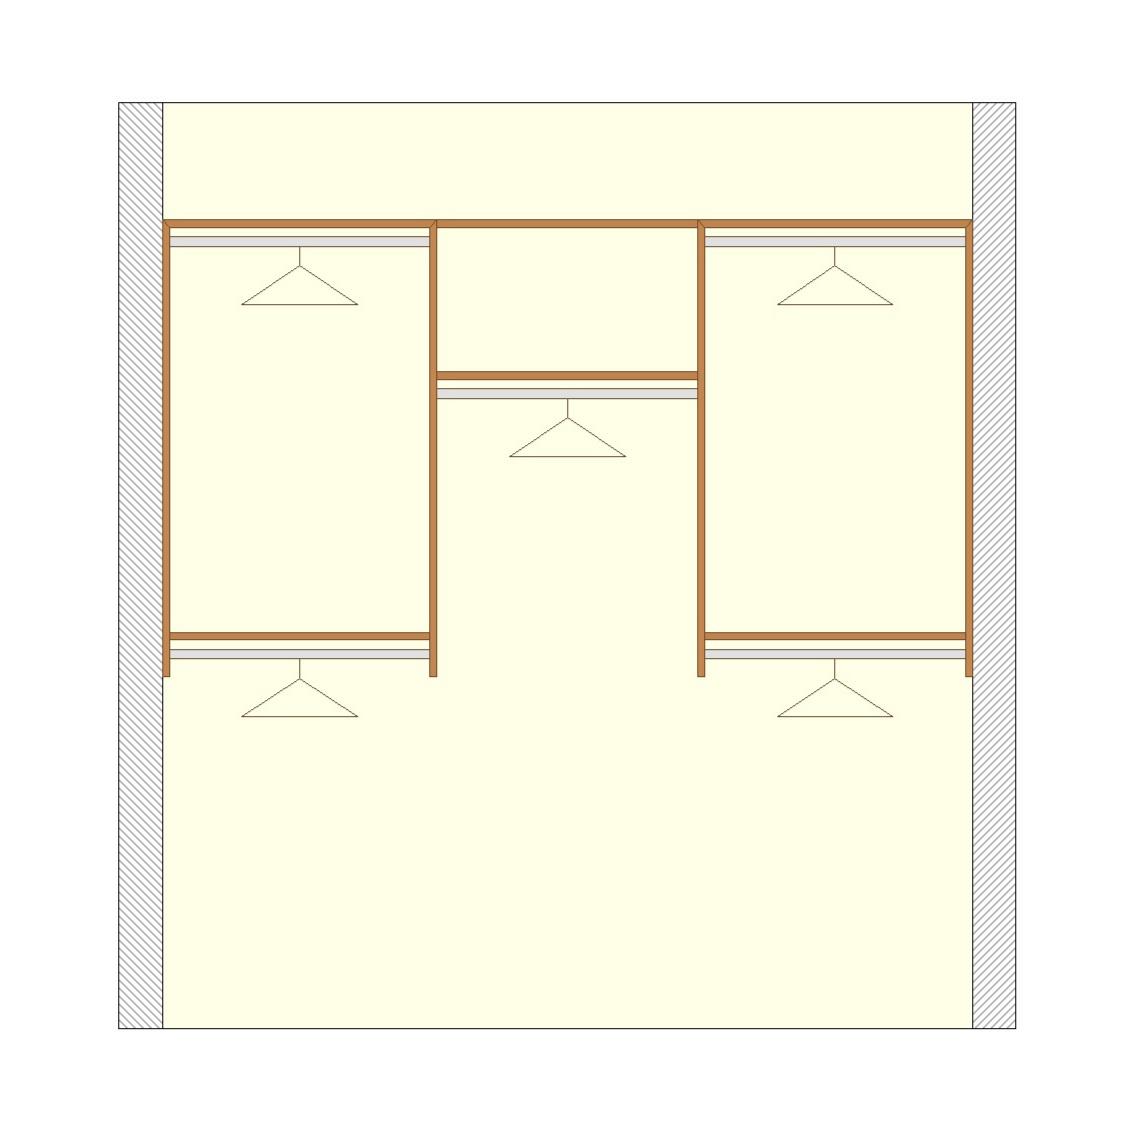 Basic reach-in closet configuration